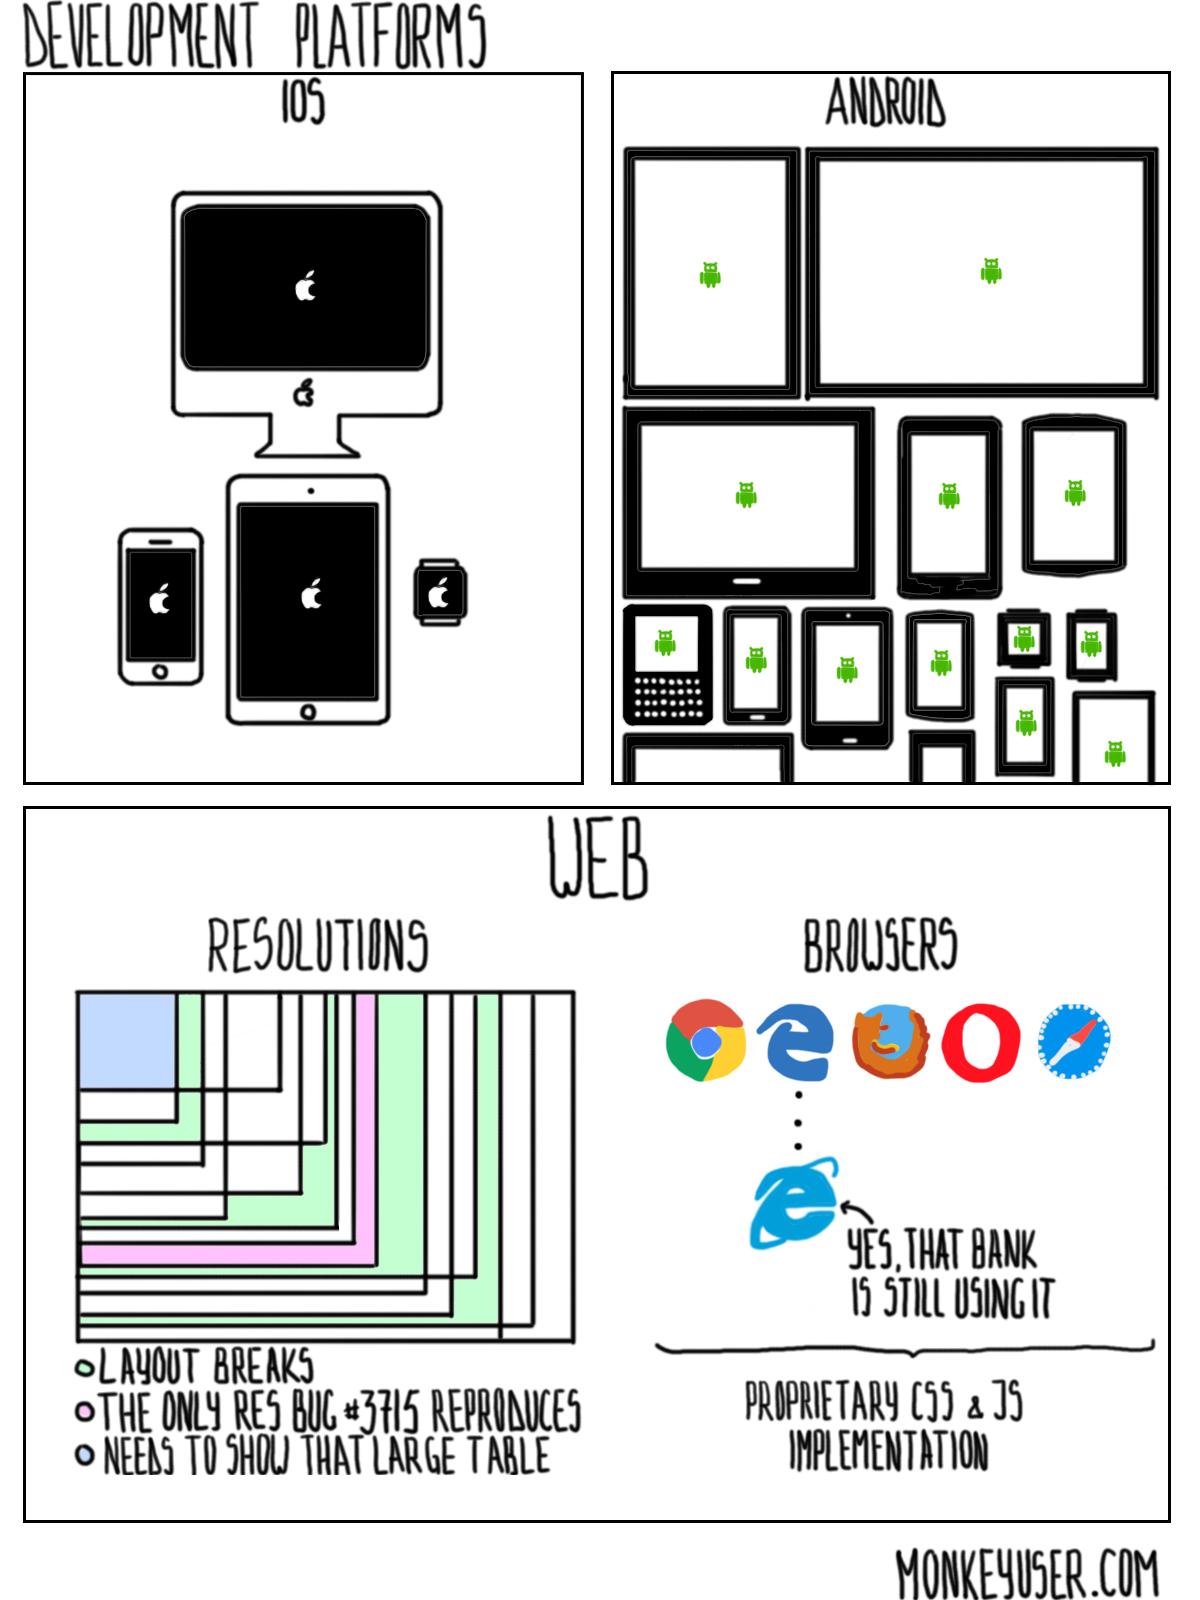 Development Platforms